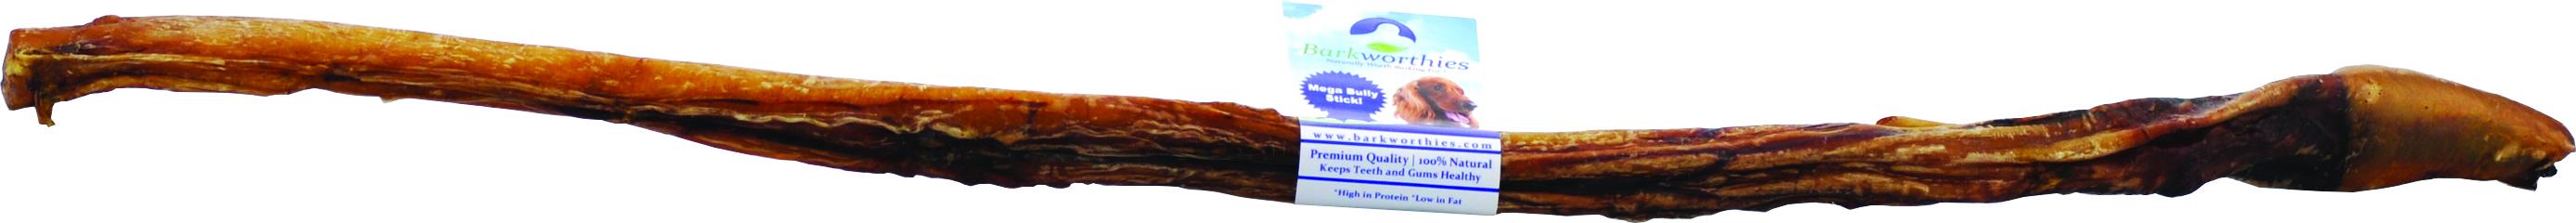 BARKWORTHIES Standard Bully Stick Mega